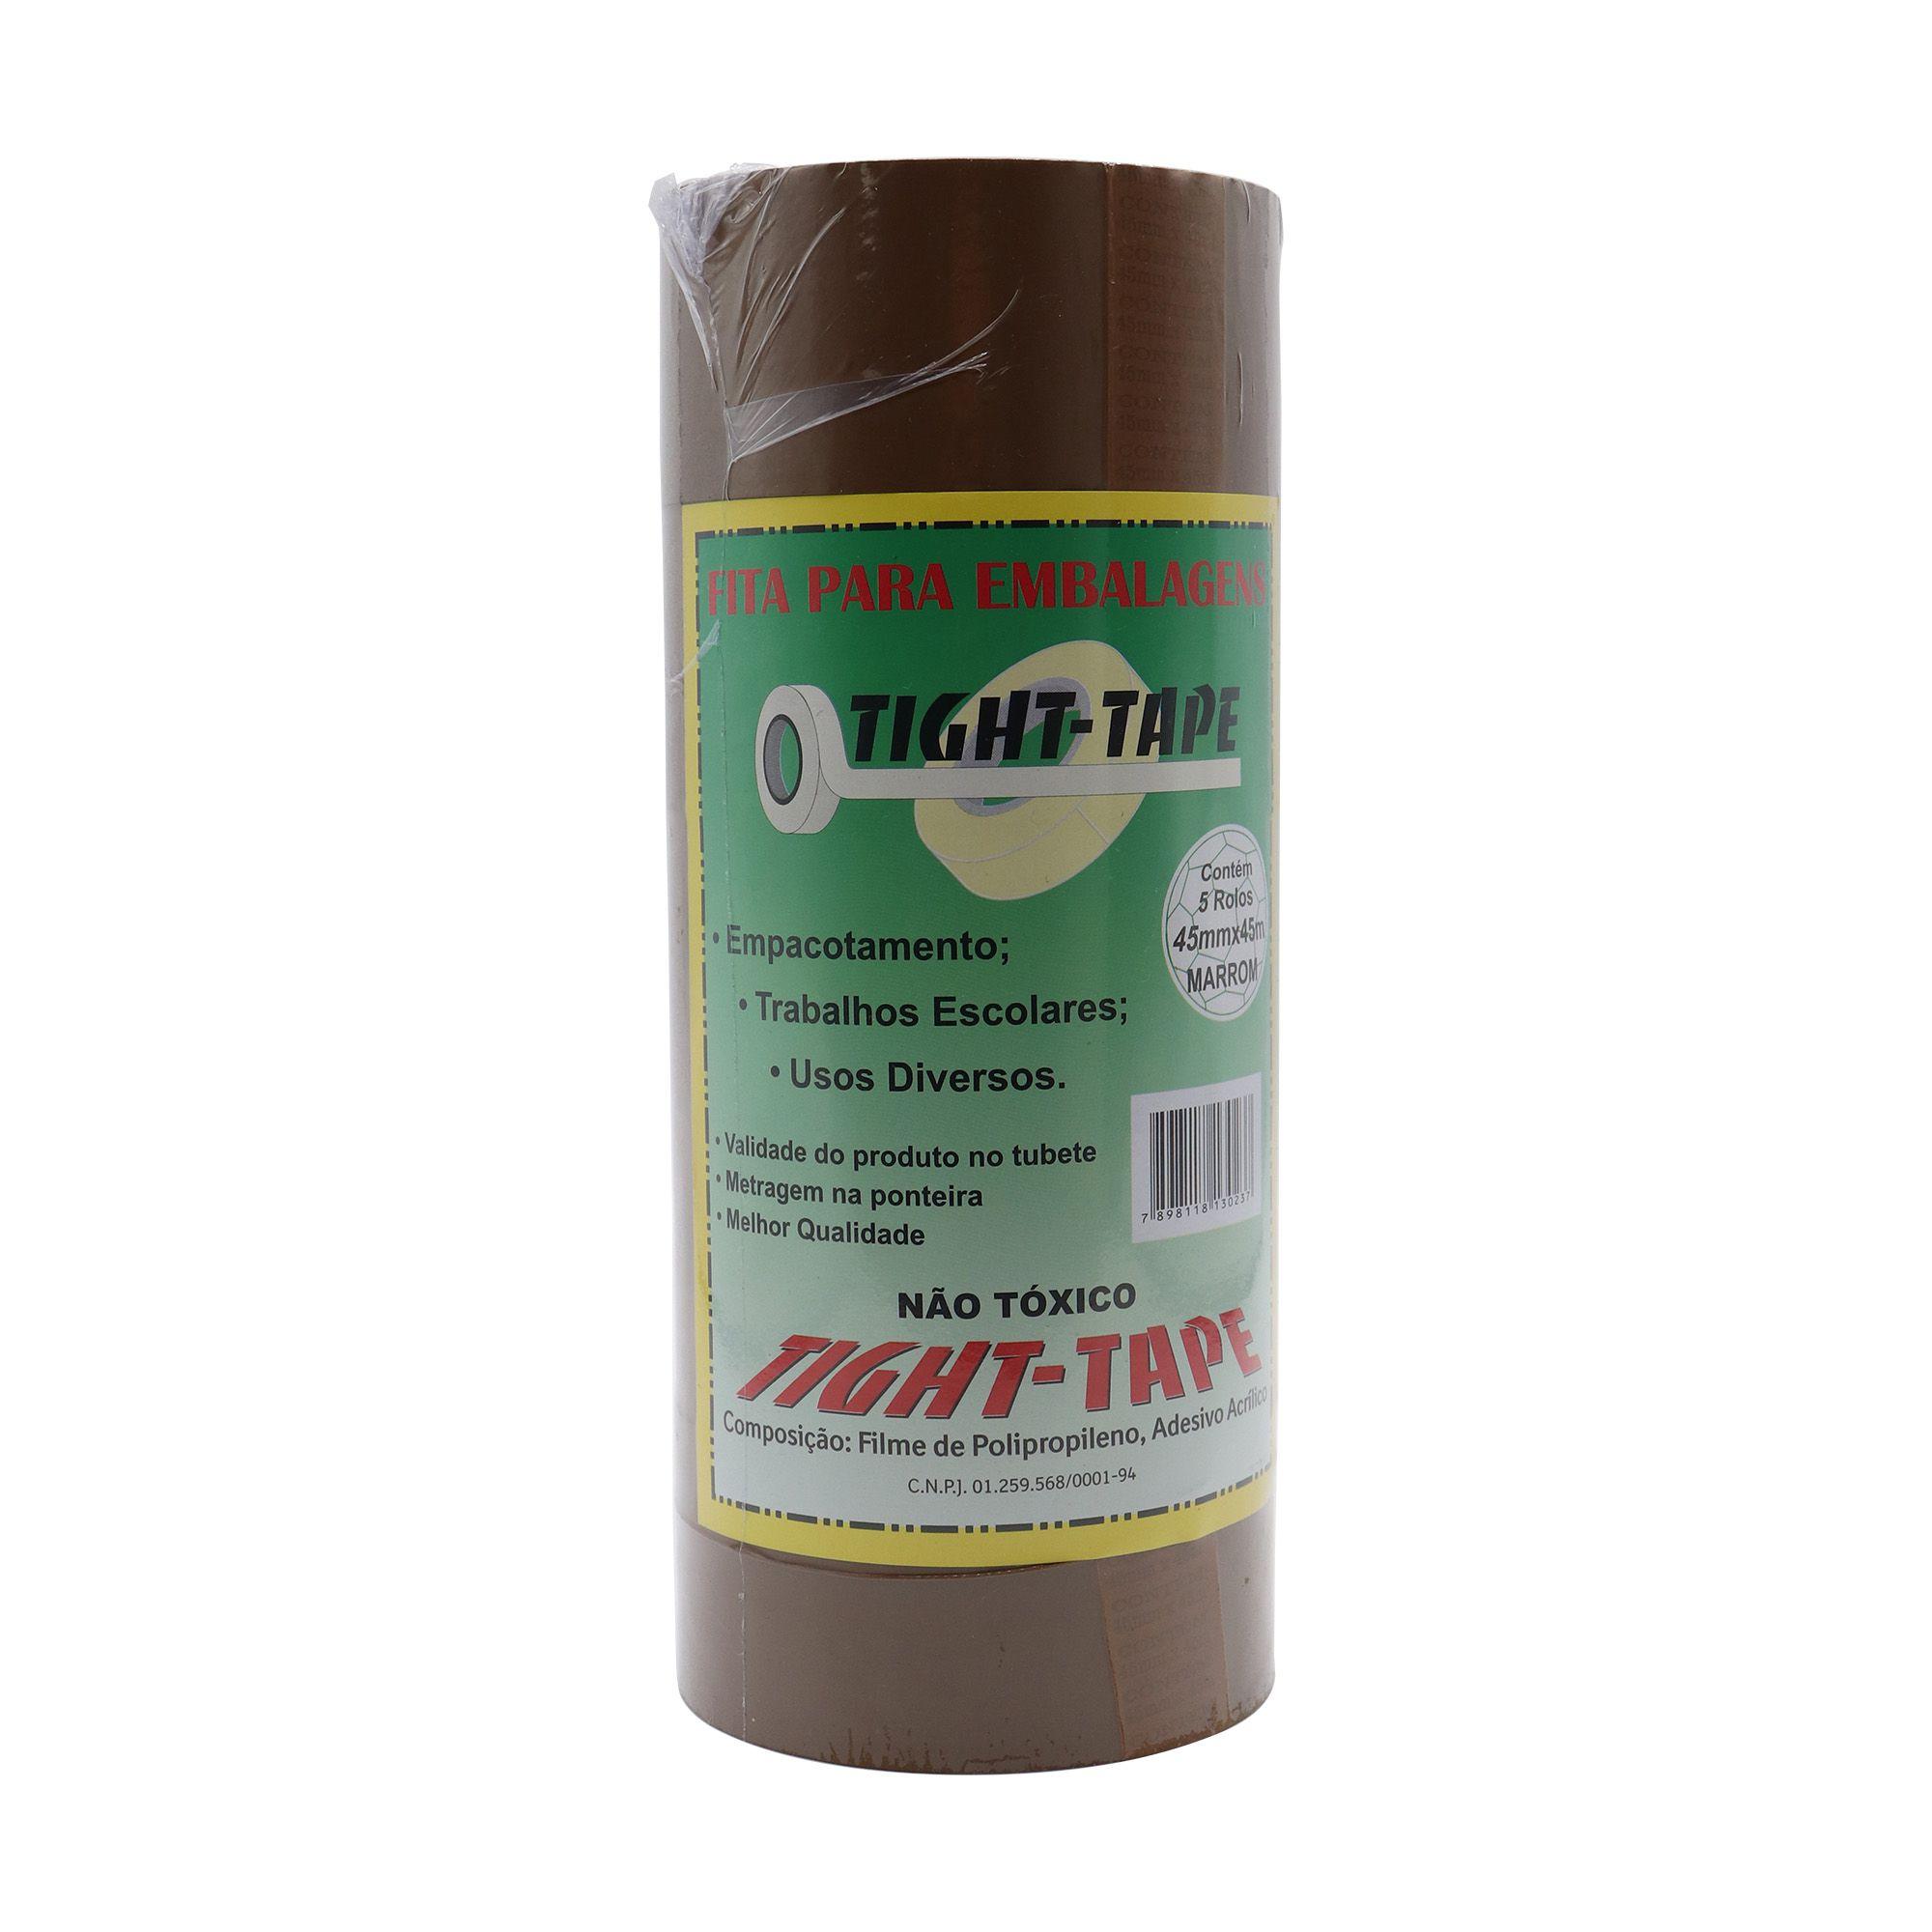 Fita Marrom para Embalagens - 45mmx45m